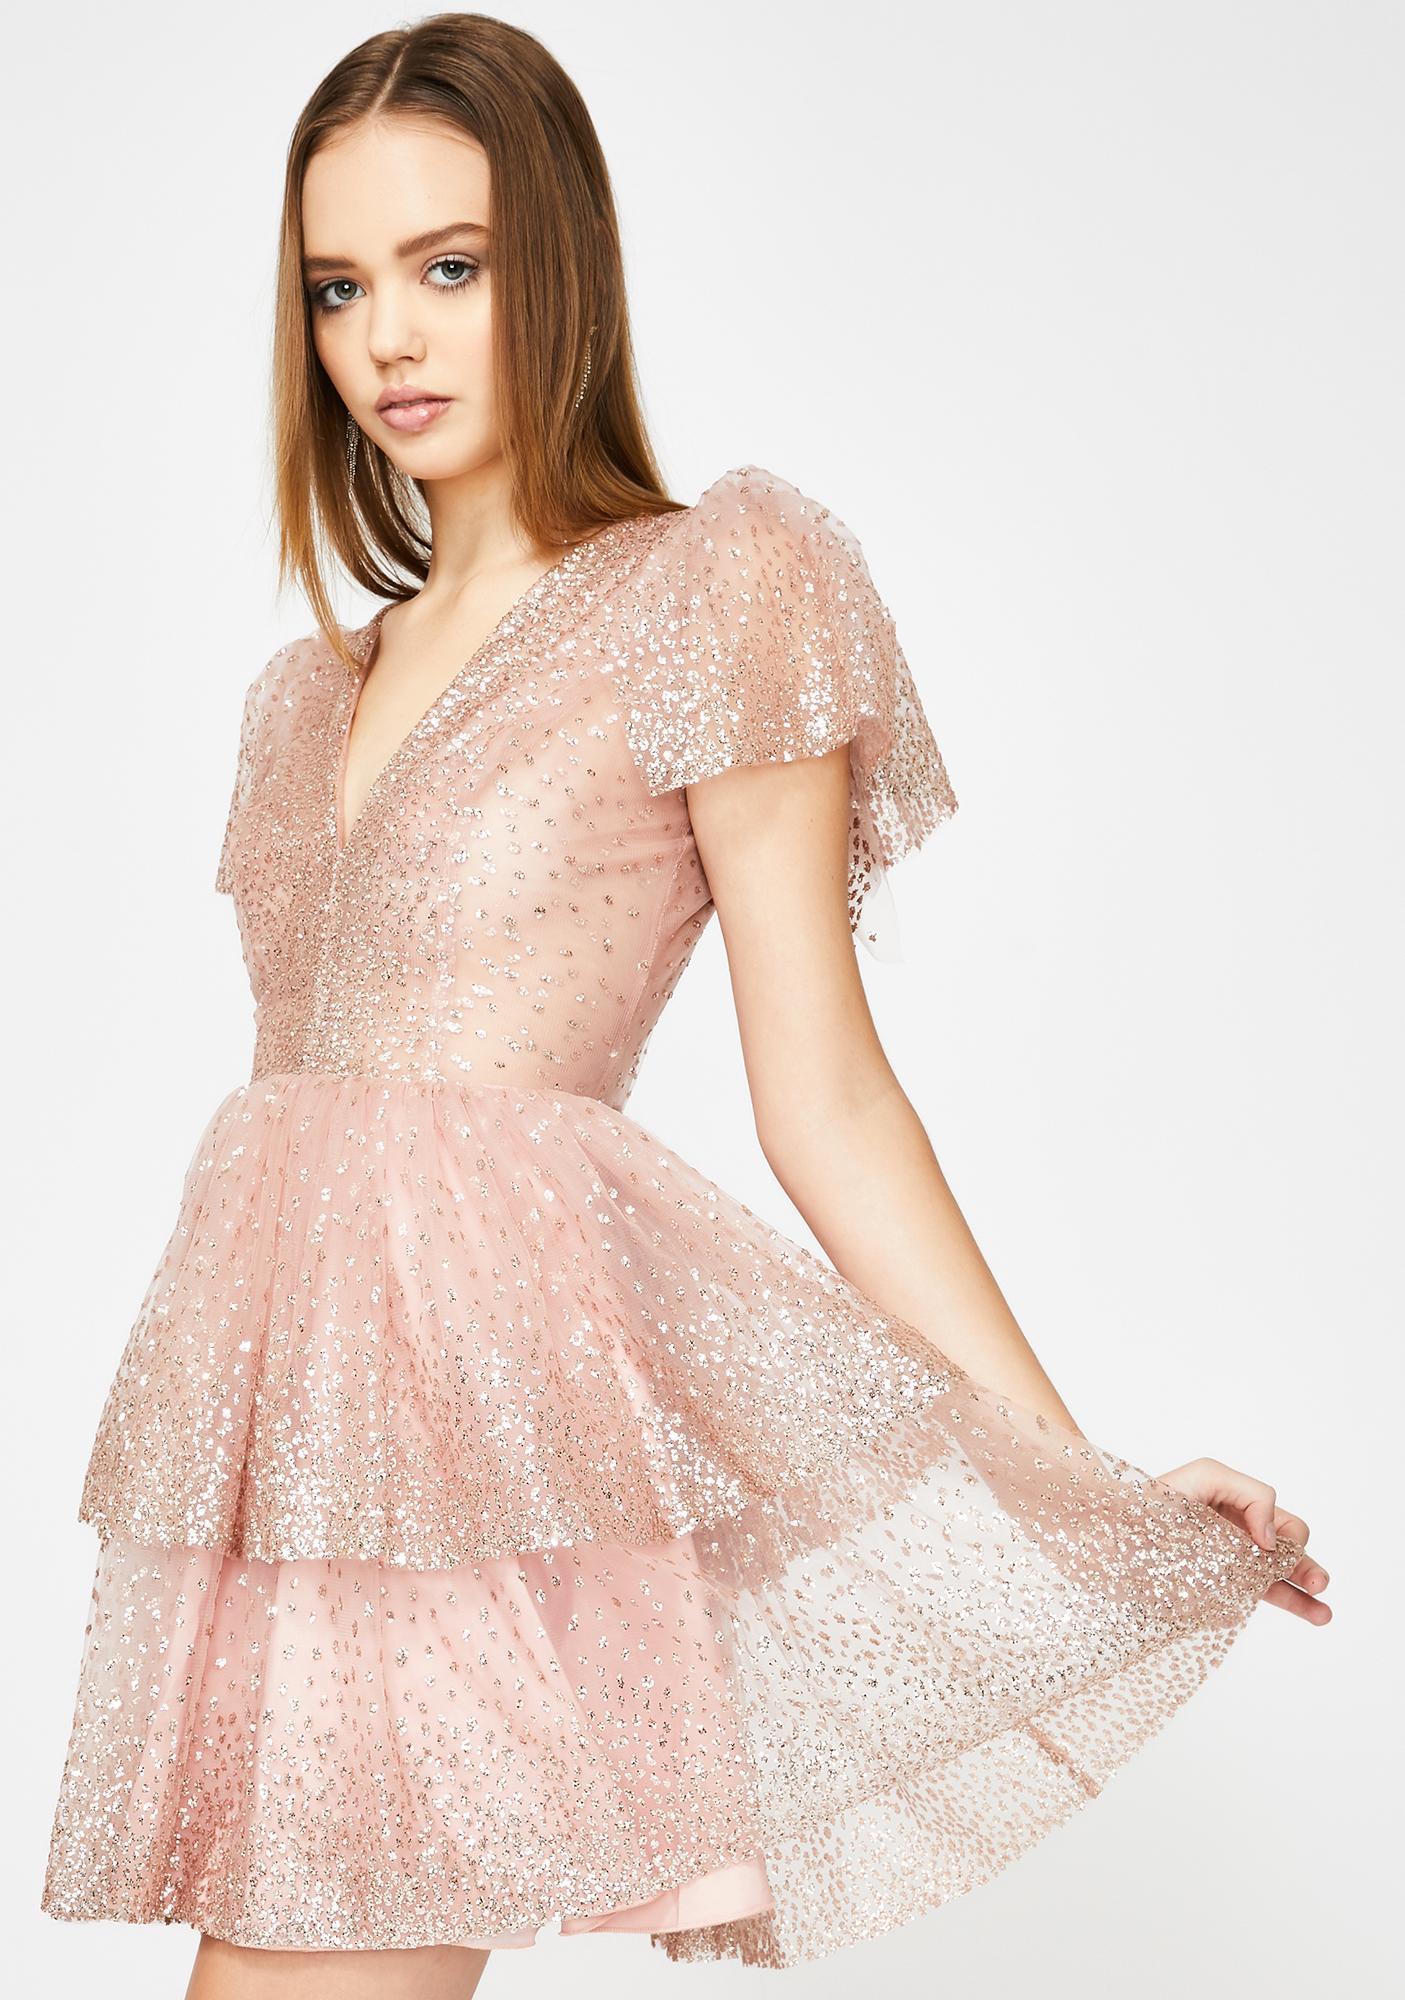 Lirika Matoshi Sara Mini Dress